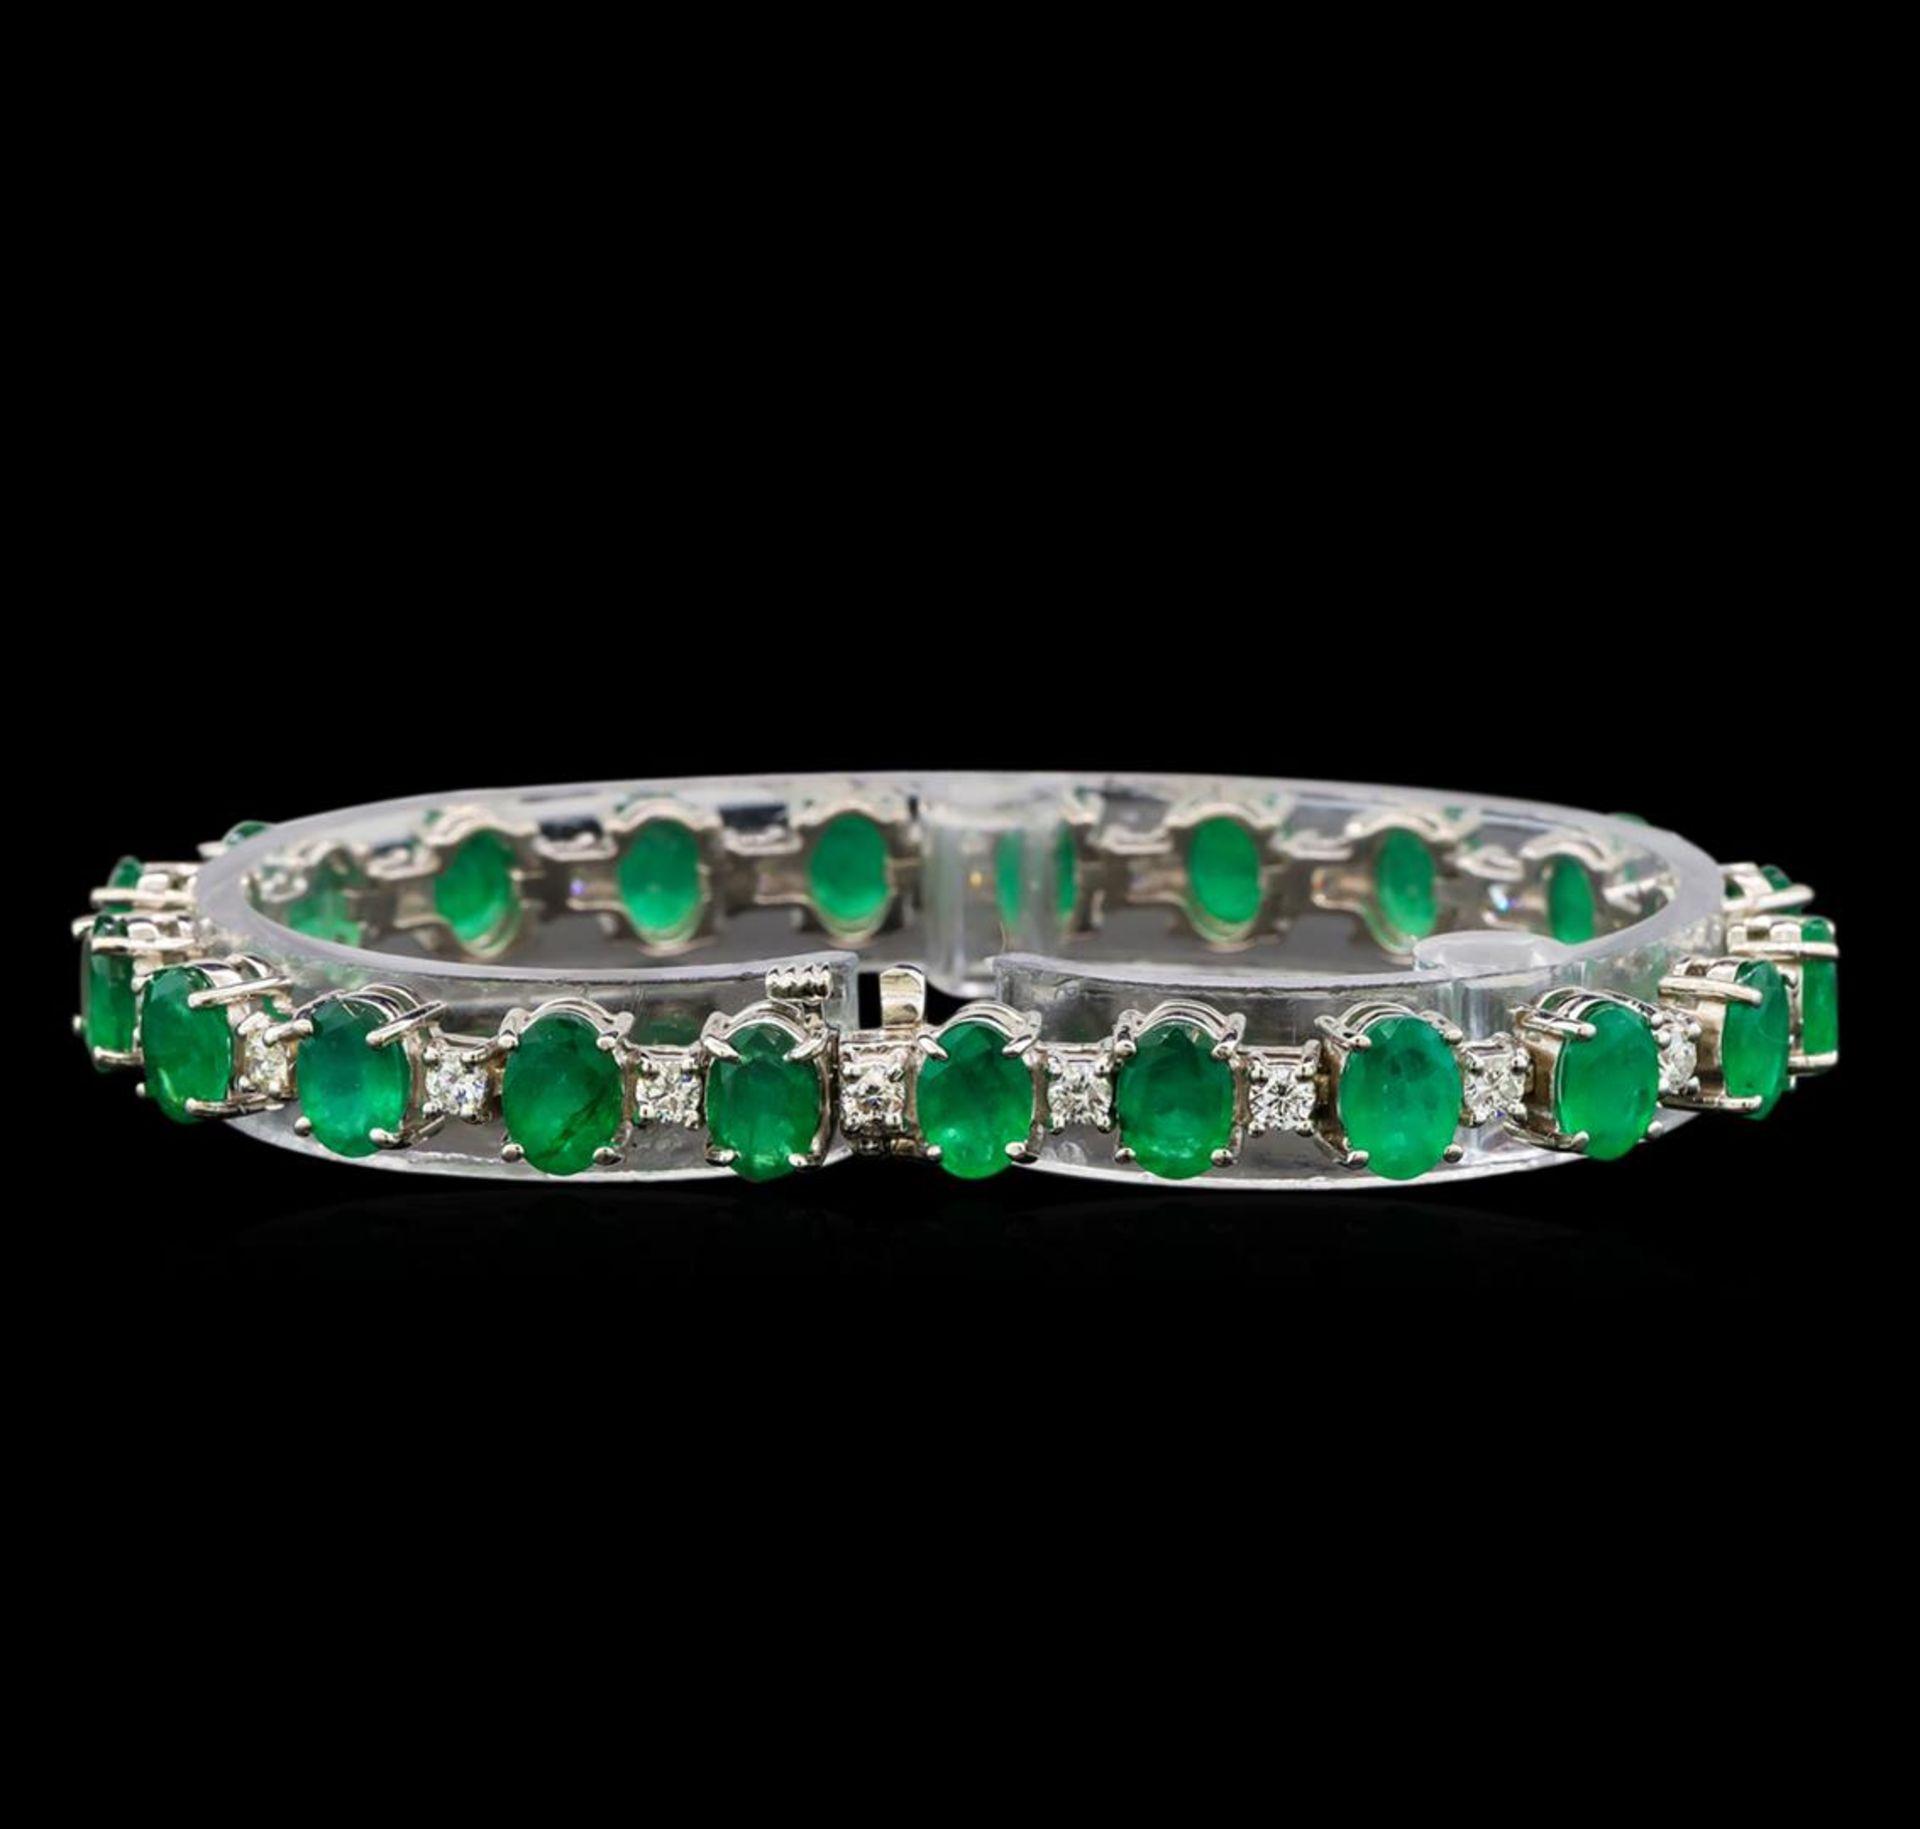 14KT White Gold 15.83 ctw Emerald and Diamond Bracelet - Image 2 of 4